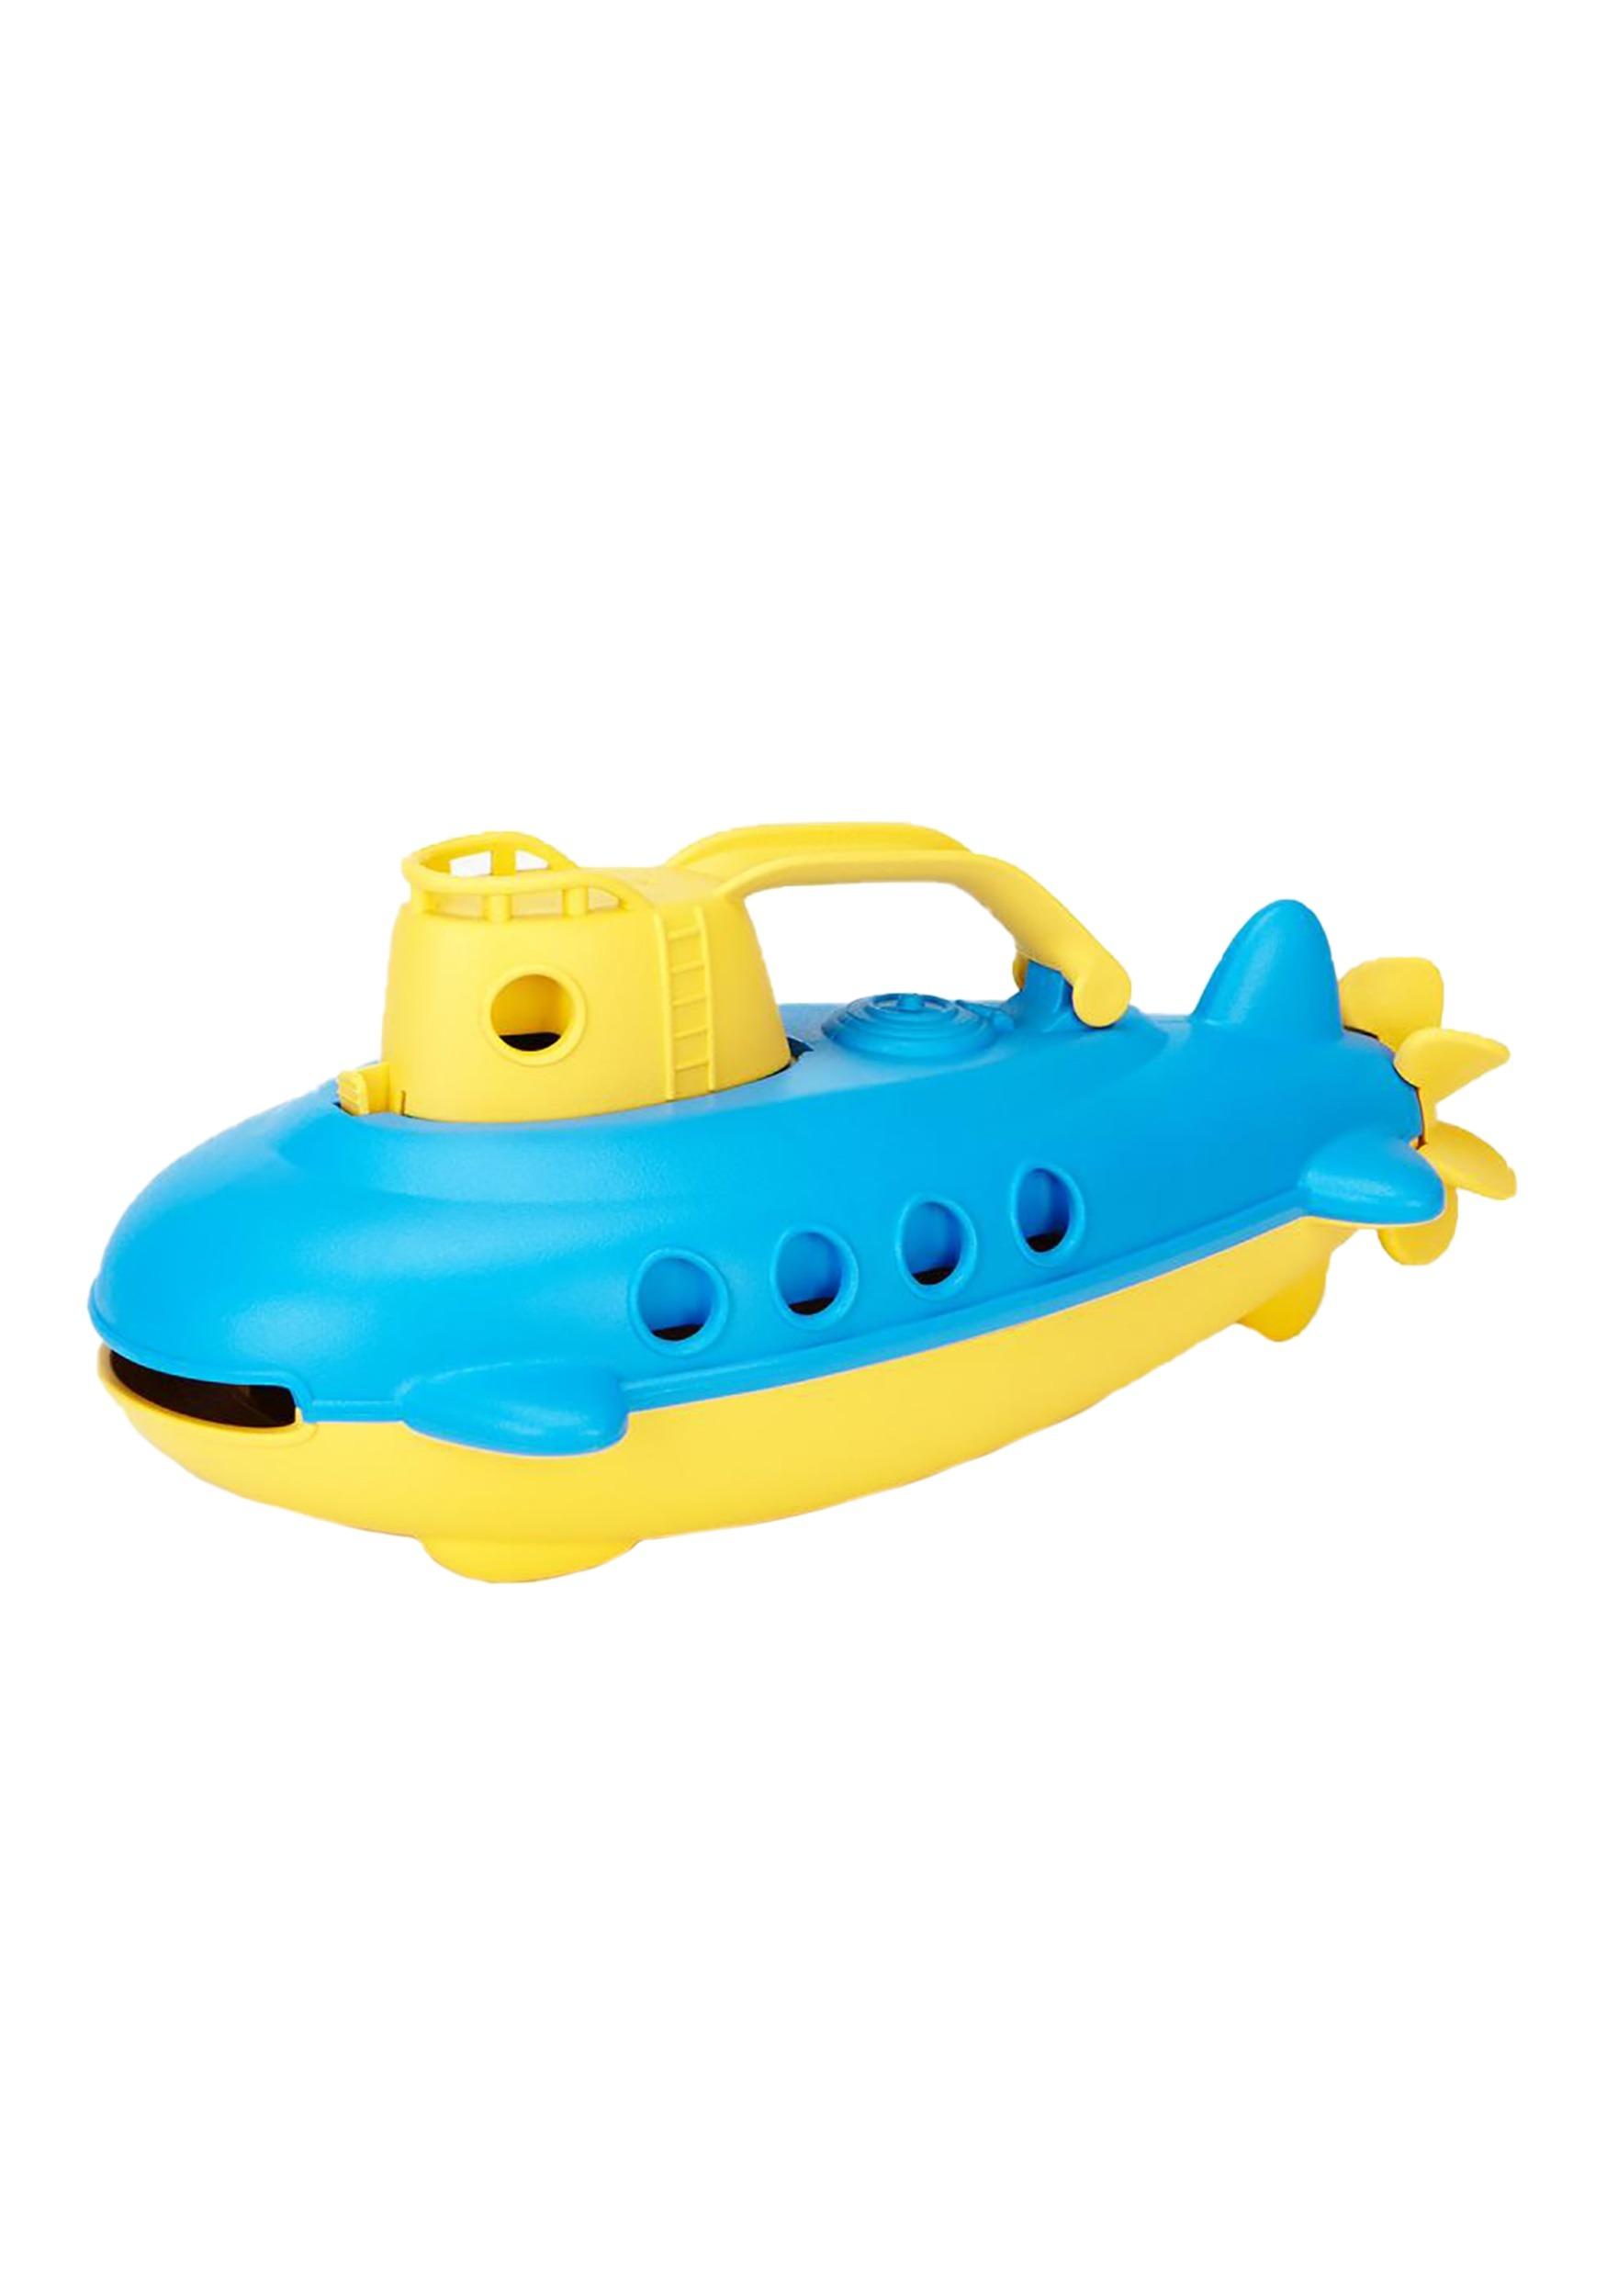 Green Toys Yellow-Handle Submarine